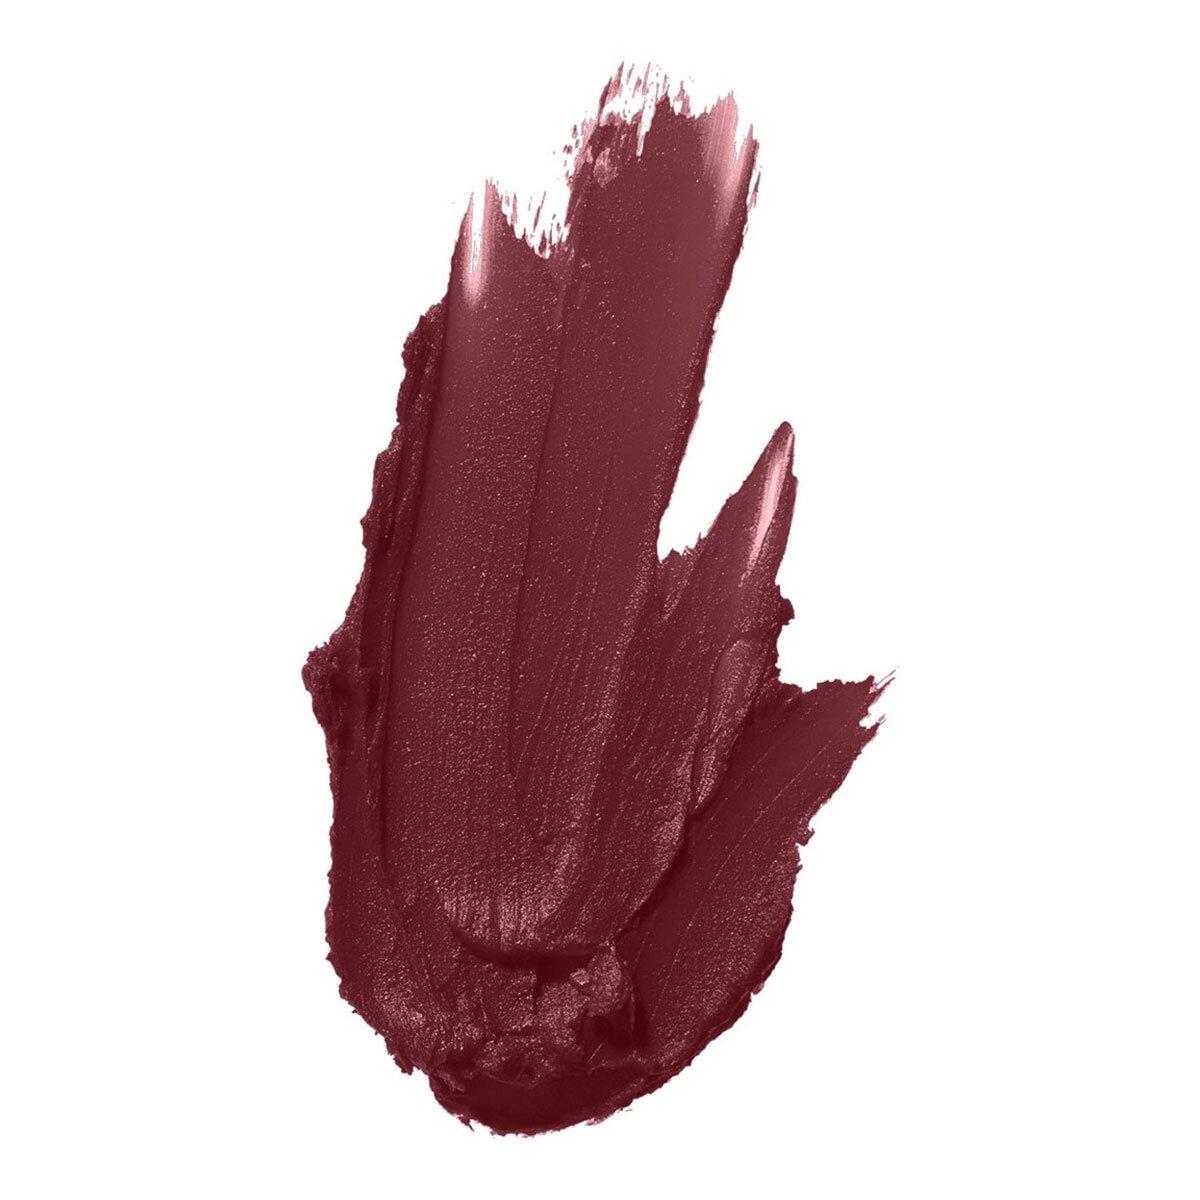 Color Sensational Matte Lipstick Ruj No. 978